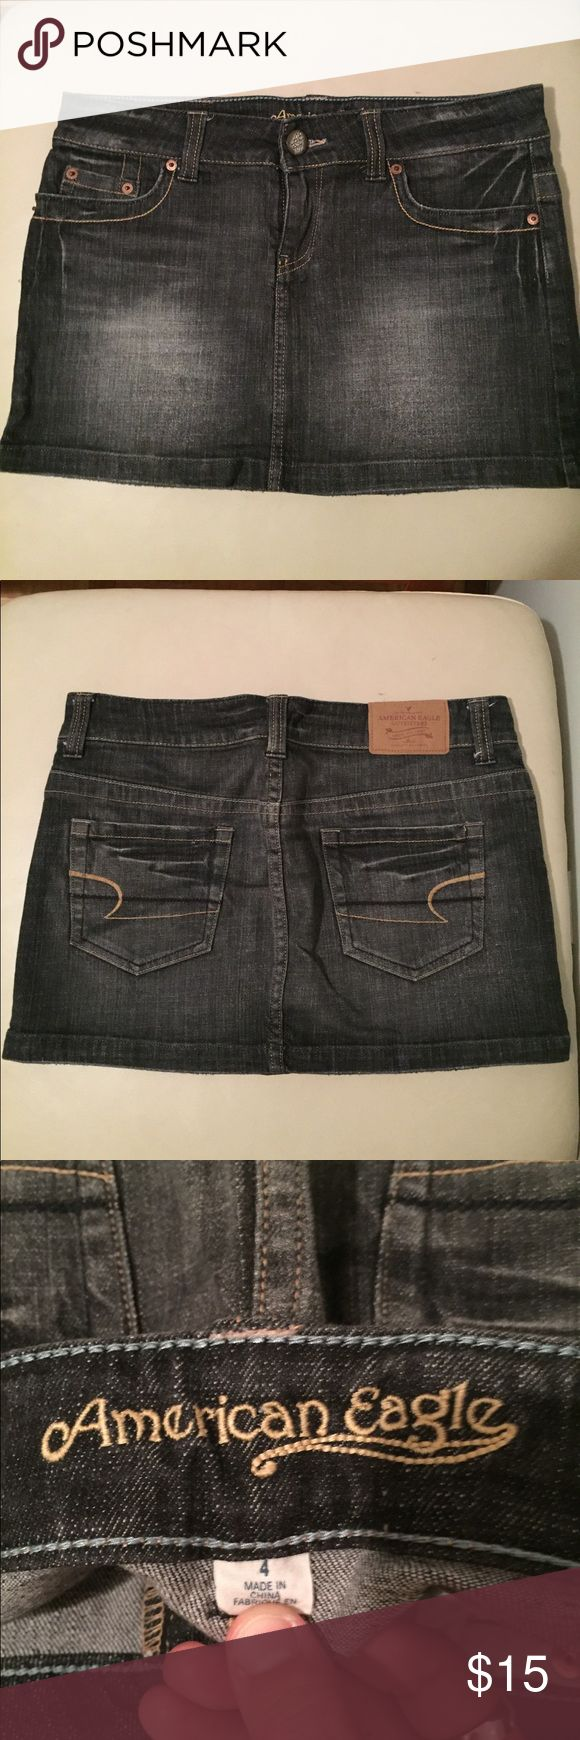 American Eagle Jean Mini Skirt American Eagle black jean mini skirt. Looks like new. Soft denim fabric. American Eagle Outfitters Skirts Mini